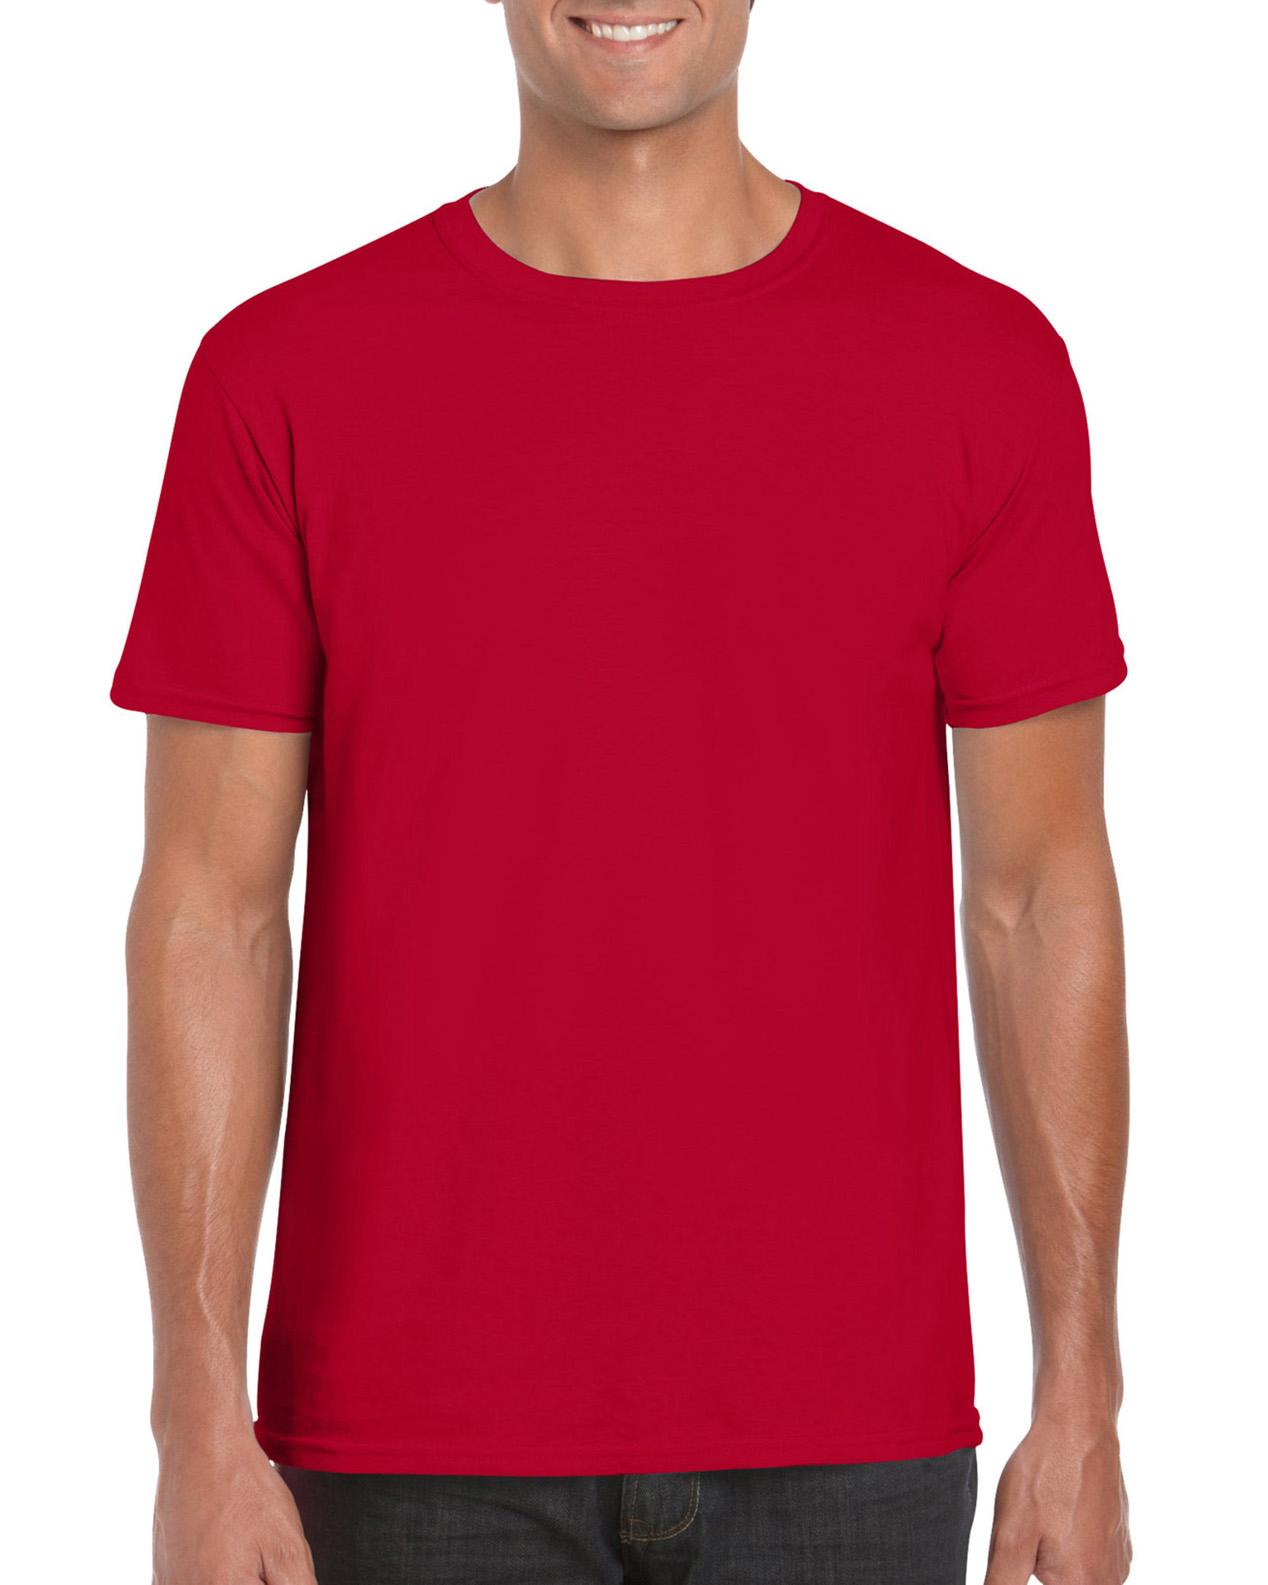 Gildan Softstyle T-Shirts